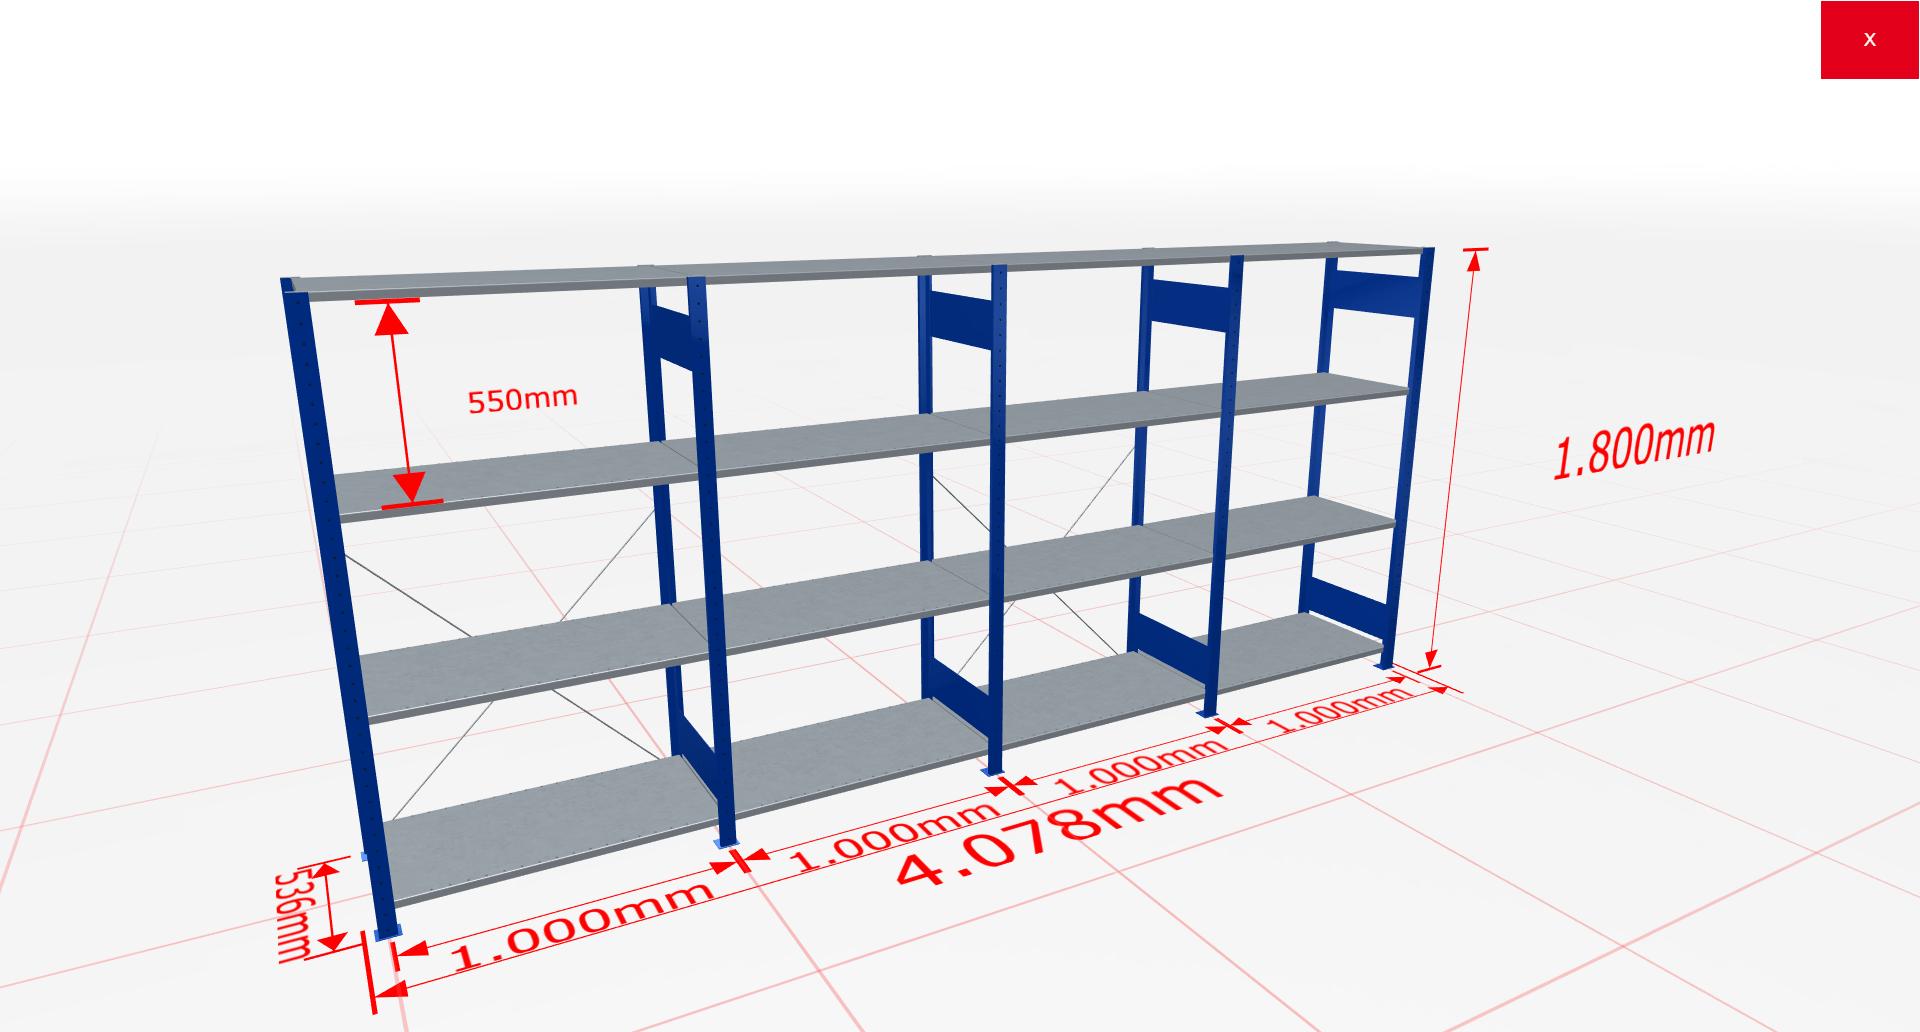 Fachbodenregal Komplettregal 1800x4078x500 mm (HxBxT) SCHULTE Lagertechnik blau 4 Ebenen  150 kg je Boden